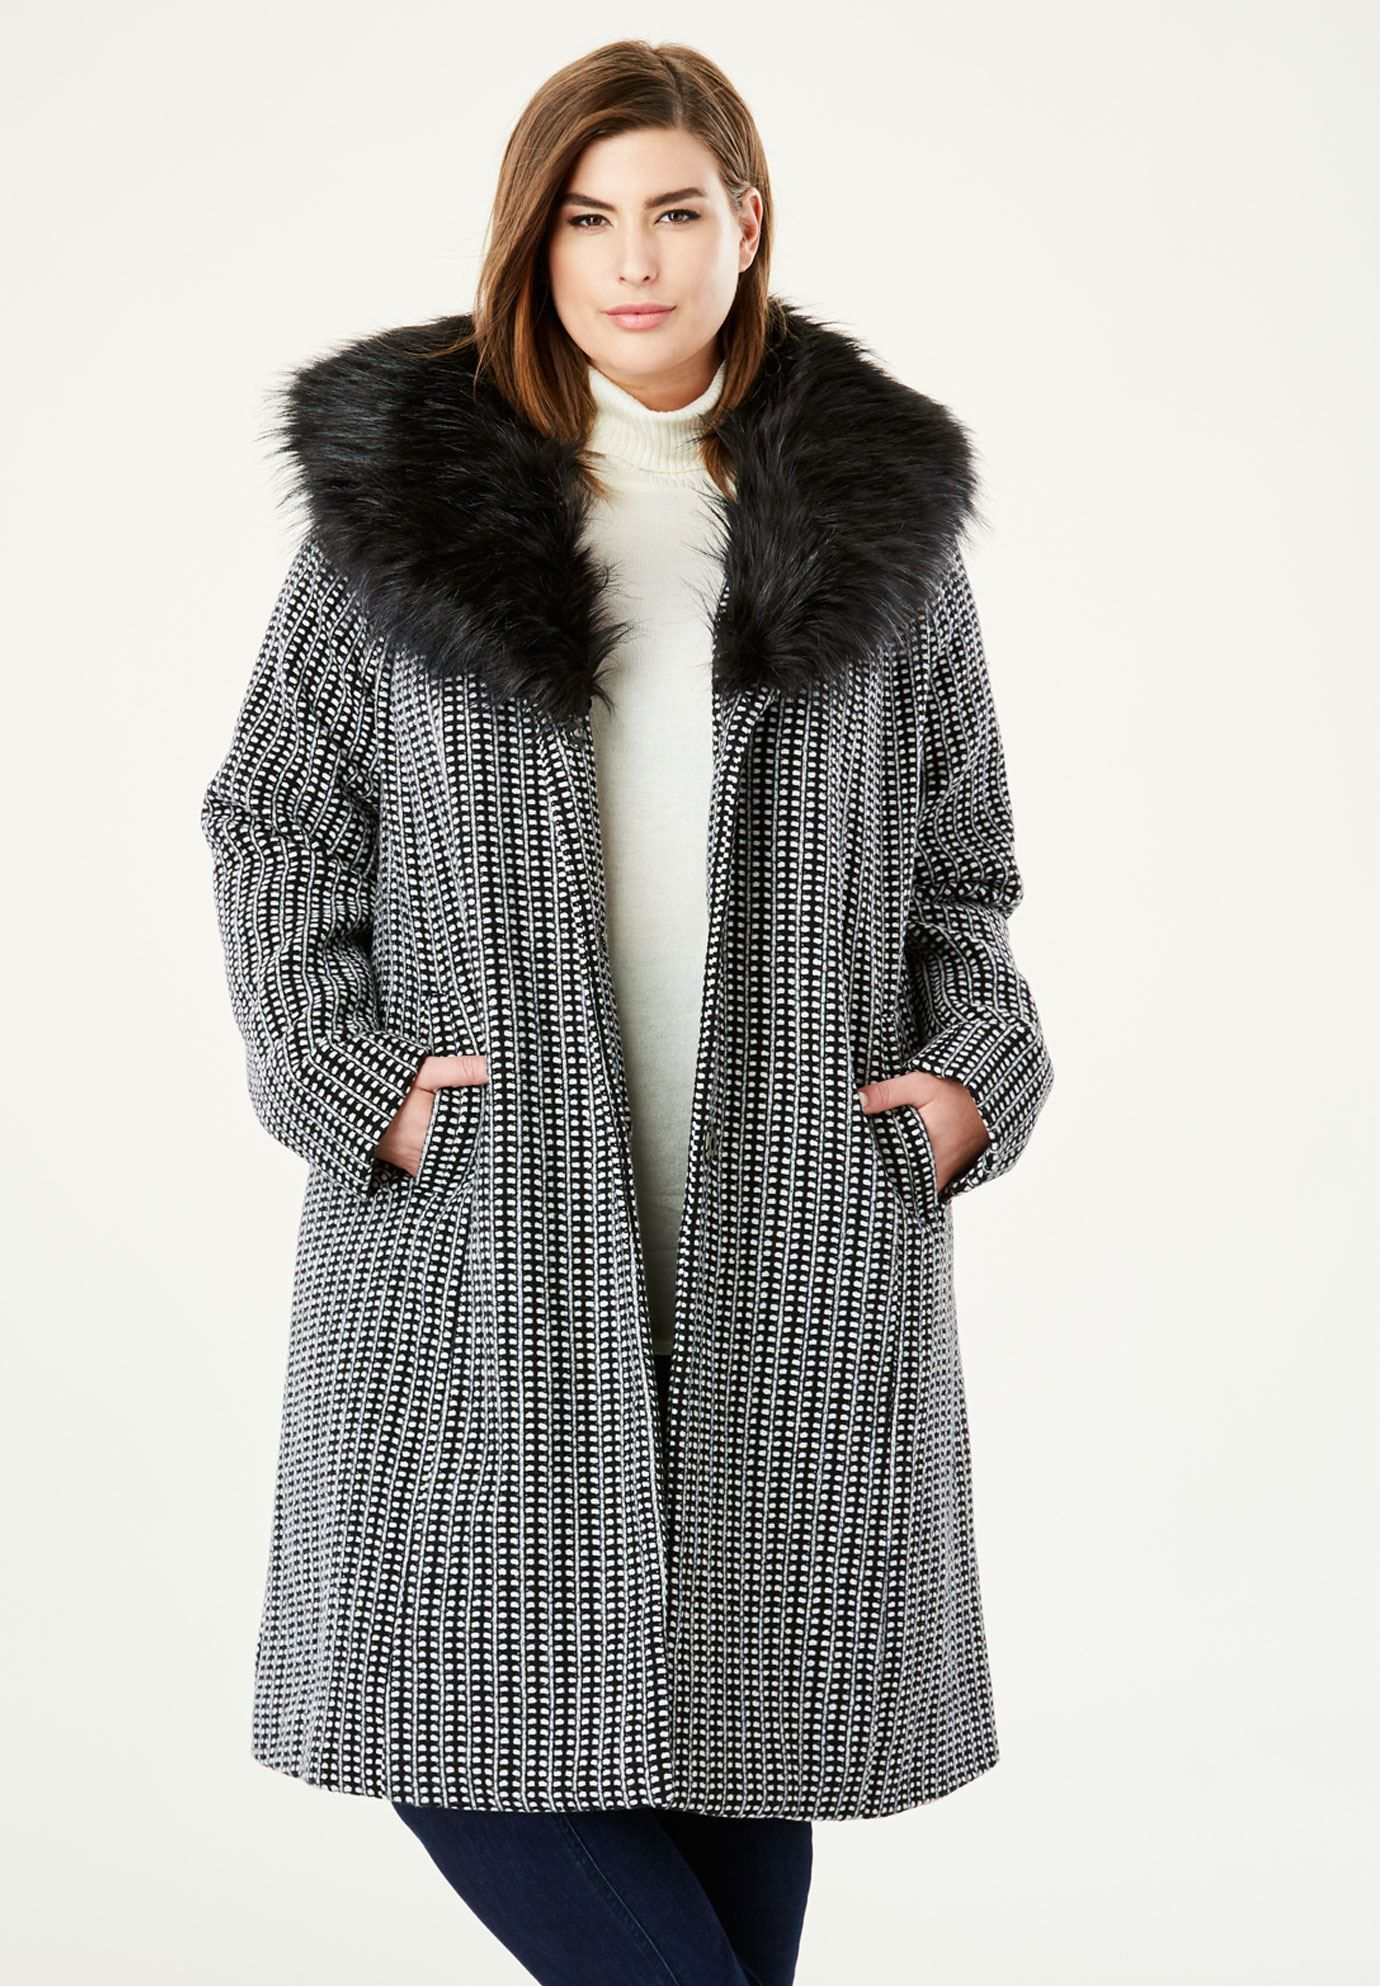 A Line Wool Blend Coat Plus Size Wool Coats Woman Within Coat Wool Blend Coat Plus Size Coats [ 1986 x 1380 Pixel ]